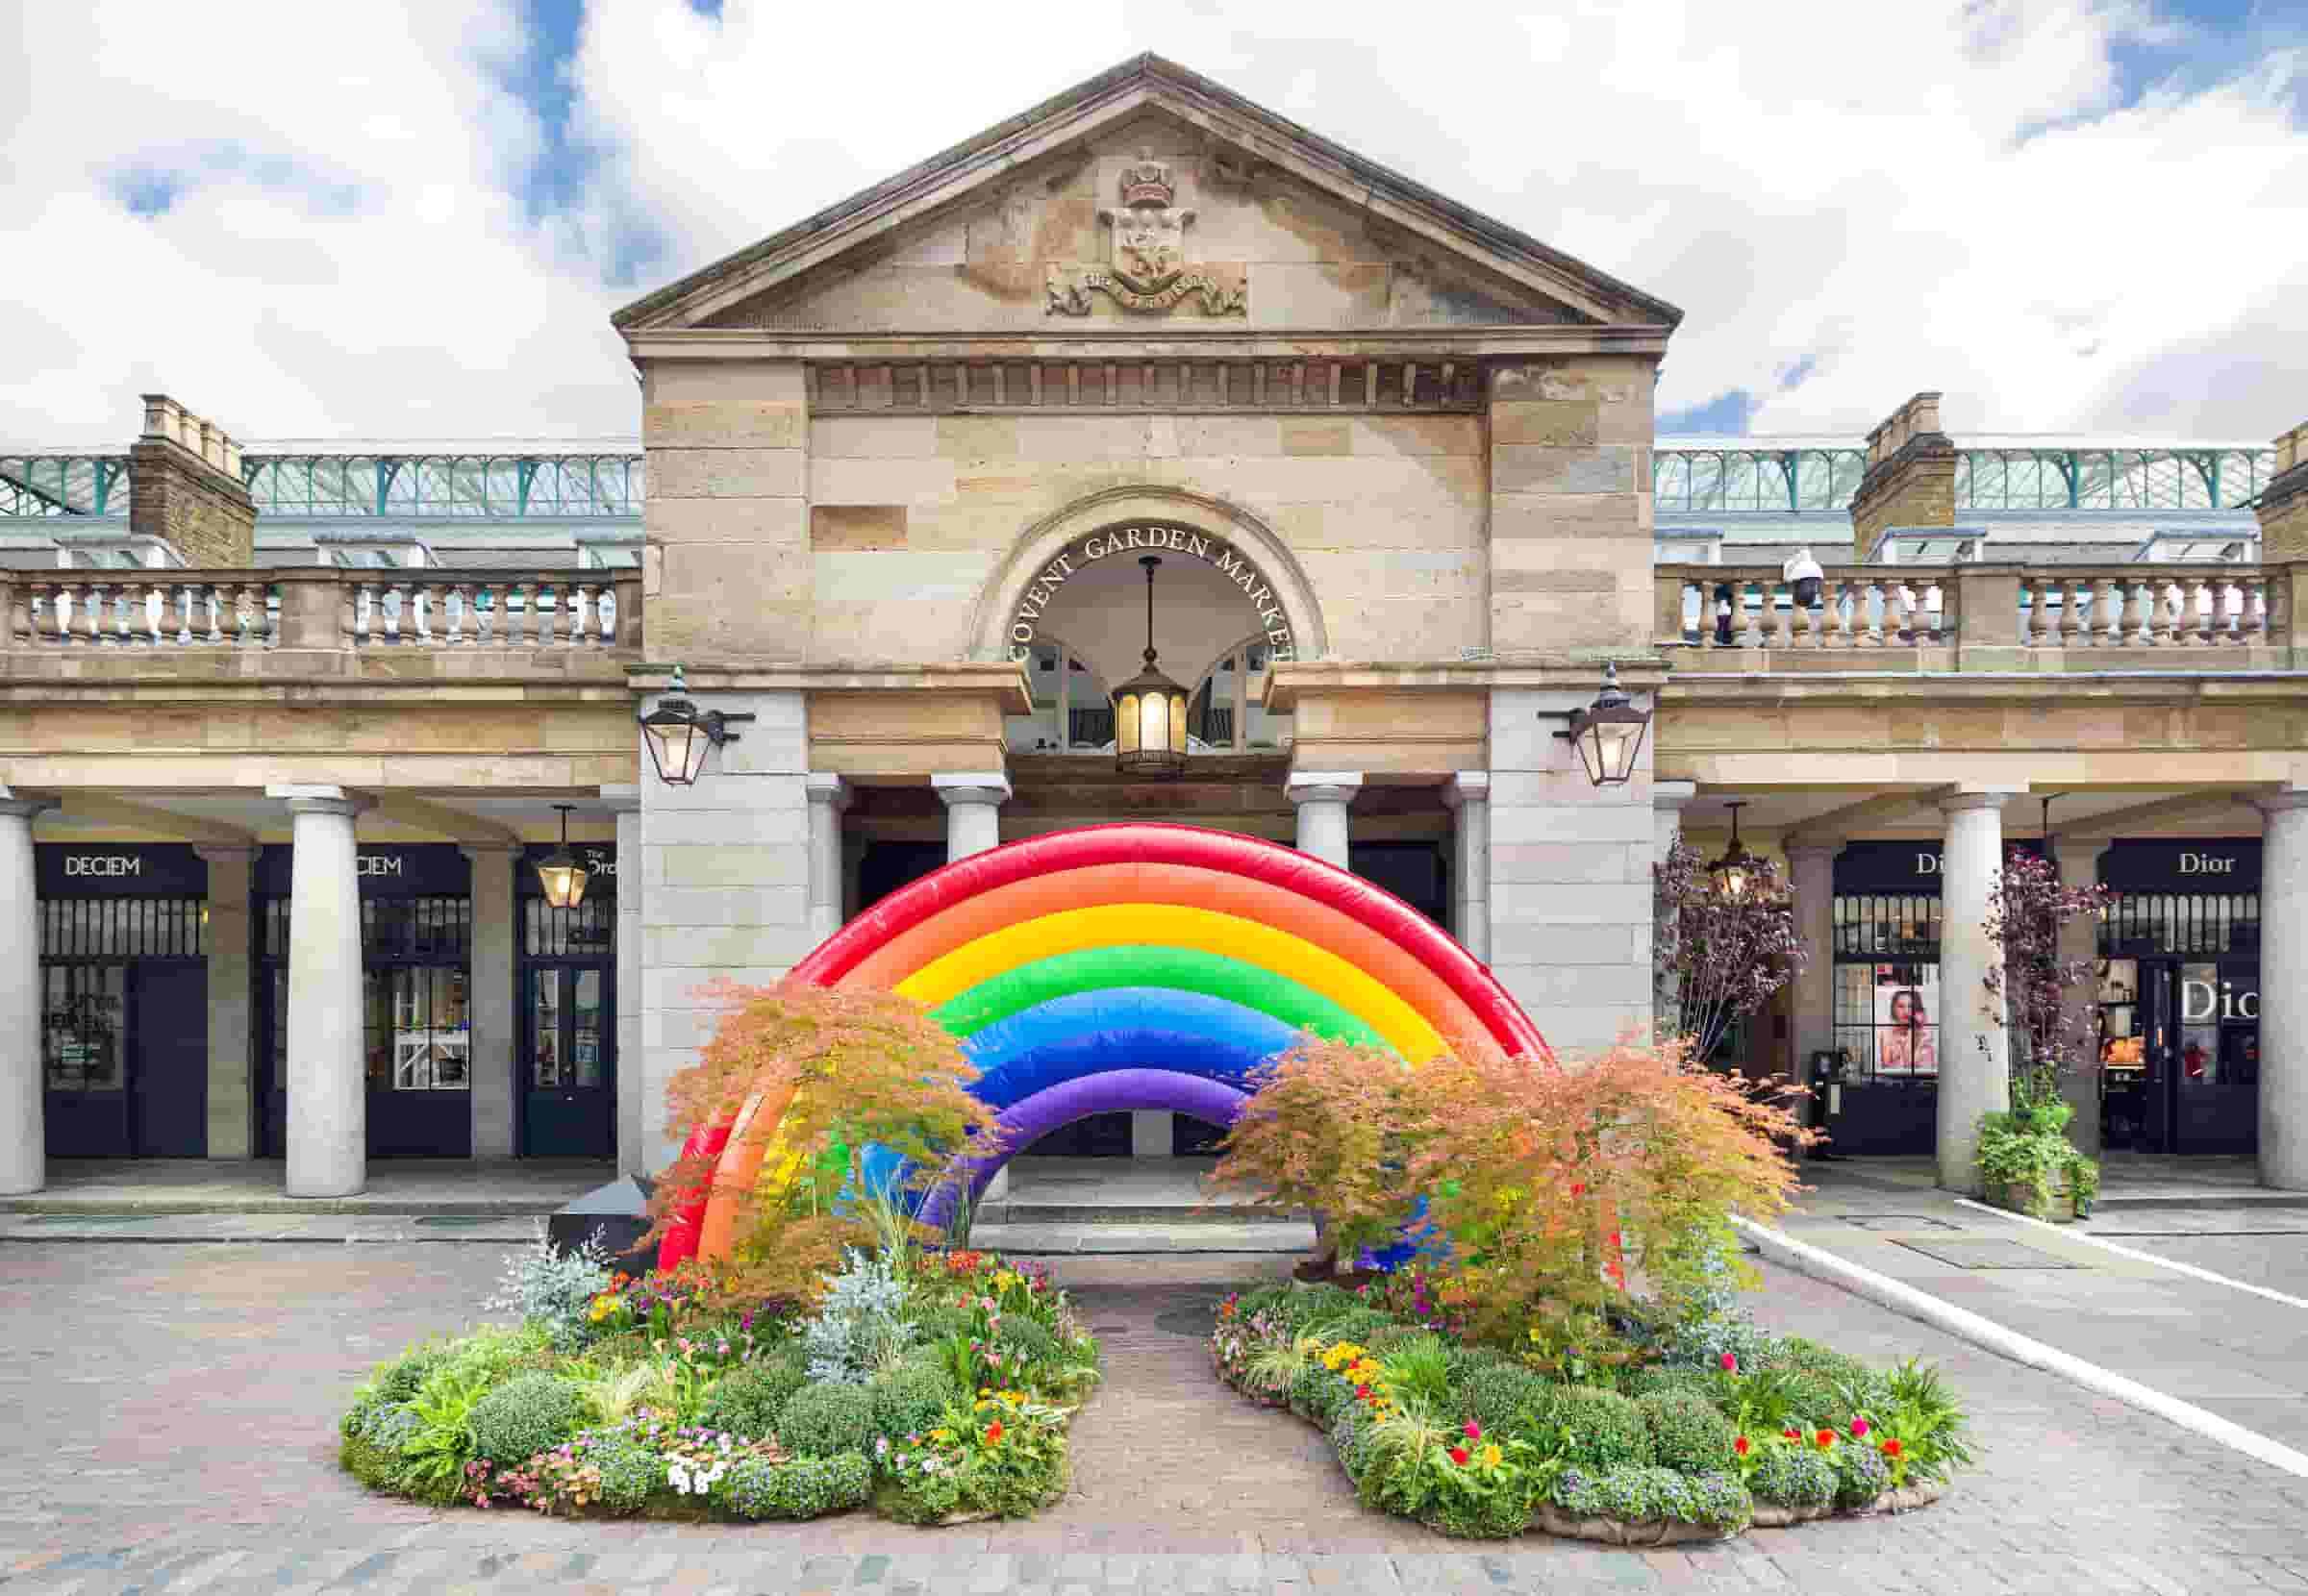 Giant rainbow in Covent Garden